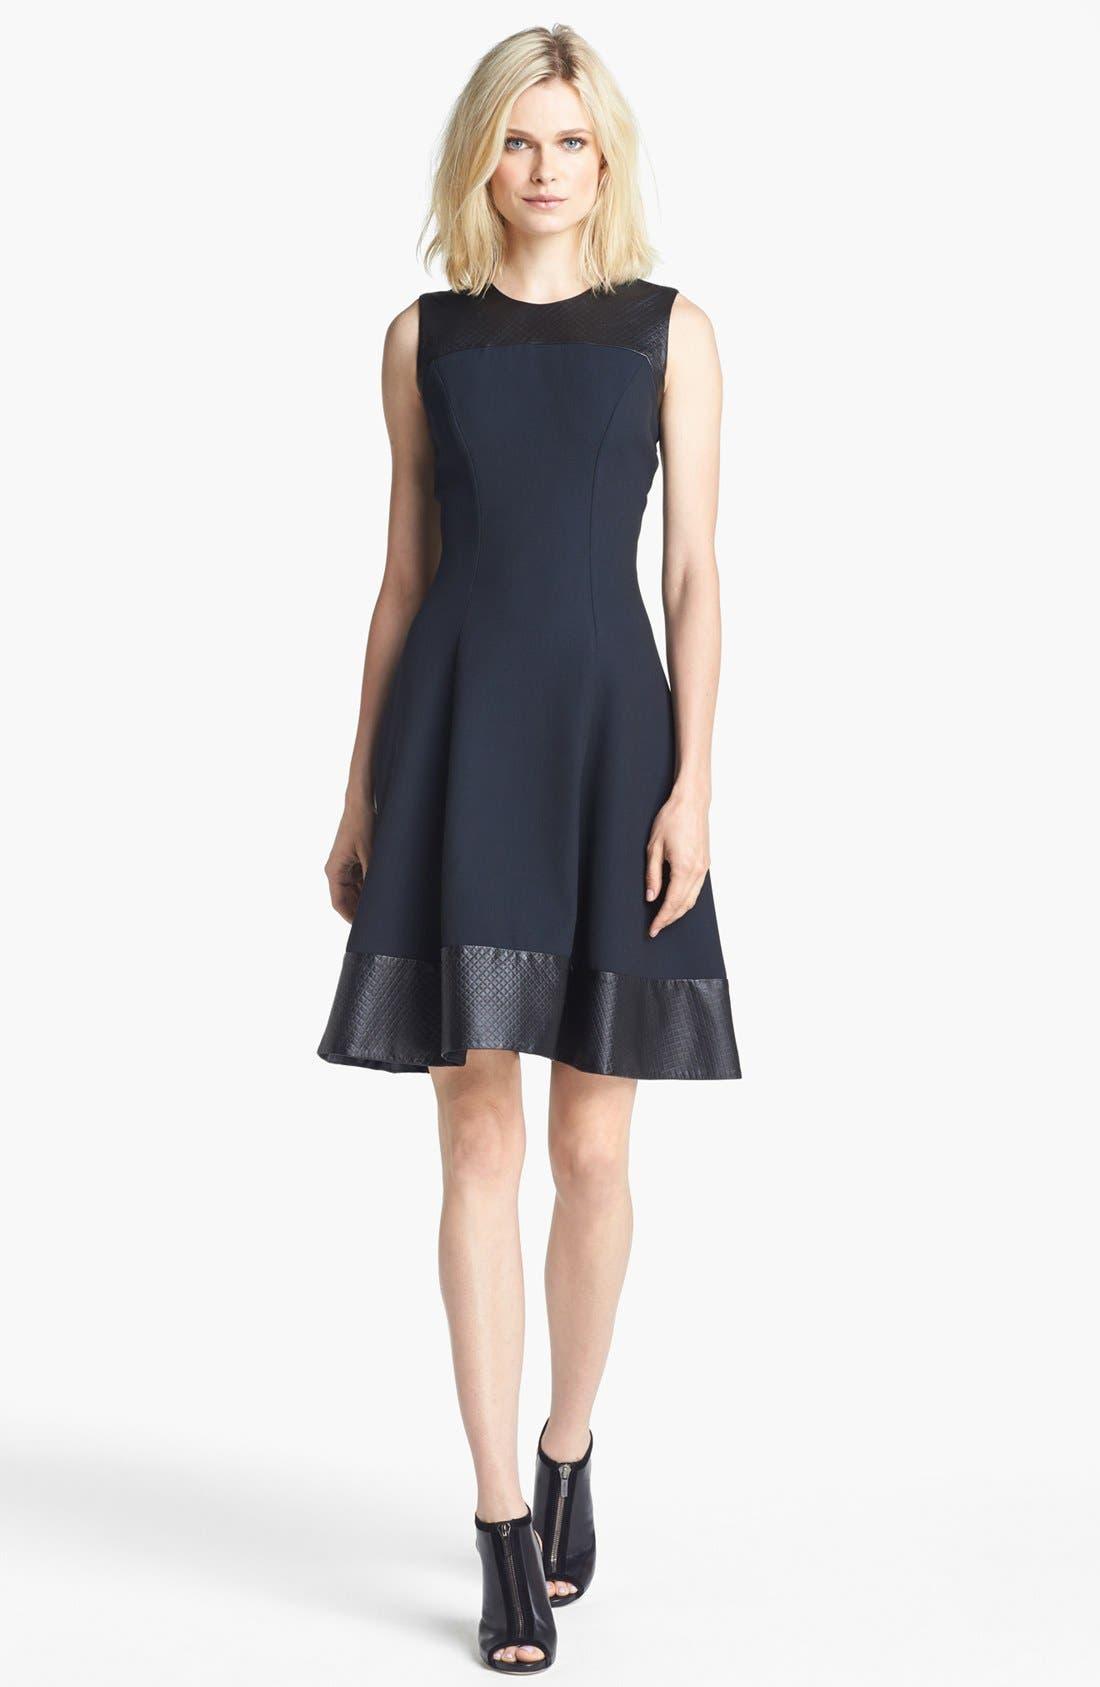 Alternate Image 1 Selected - L'AGENCE Embossed Leather Trim Ponte Knit Dress